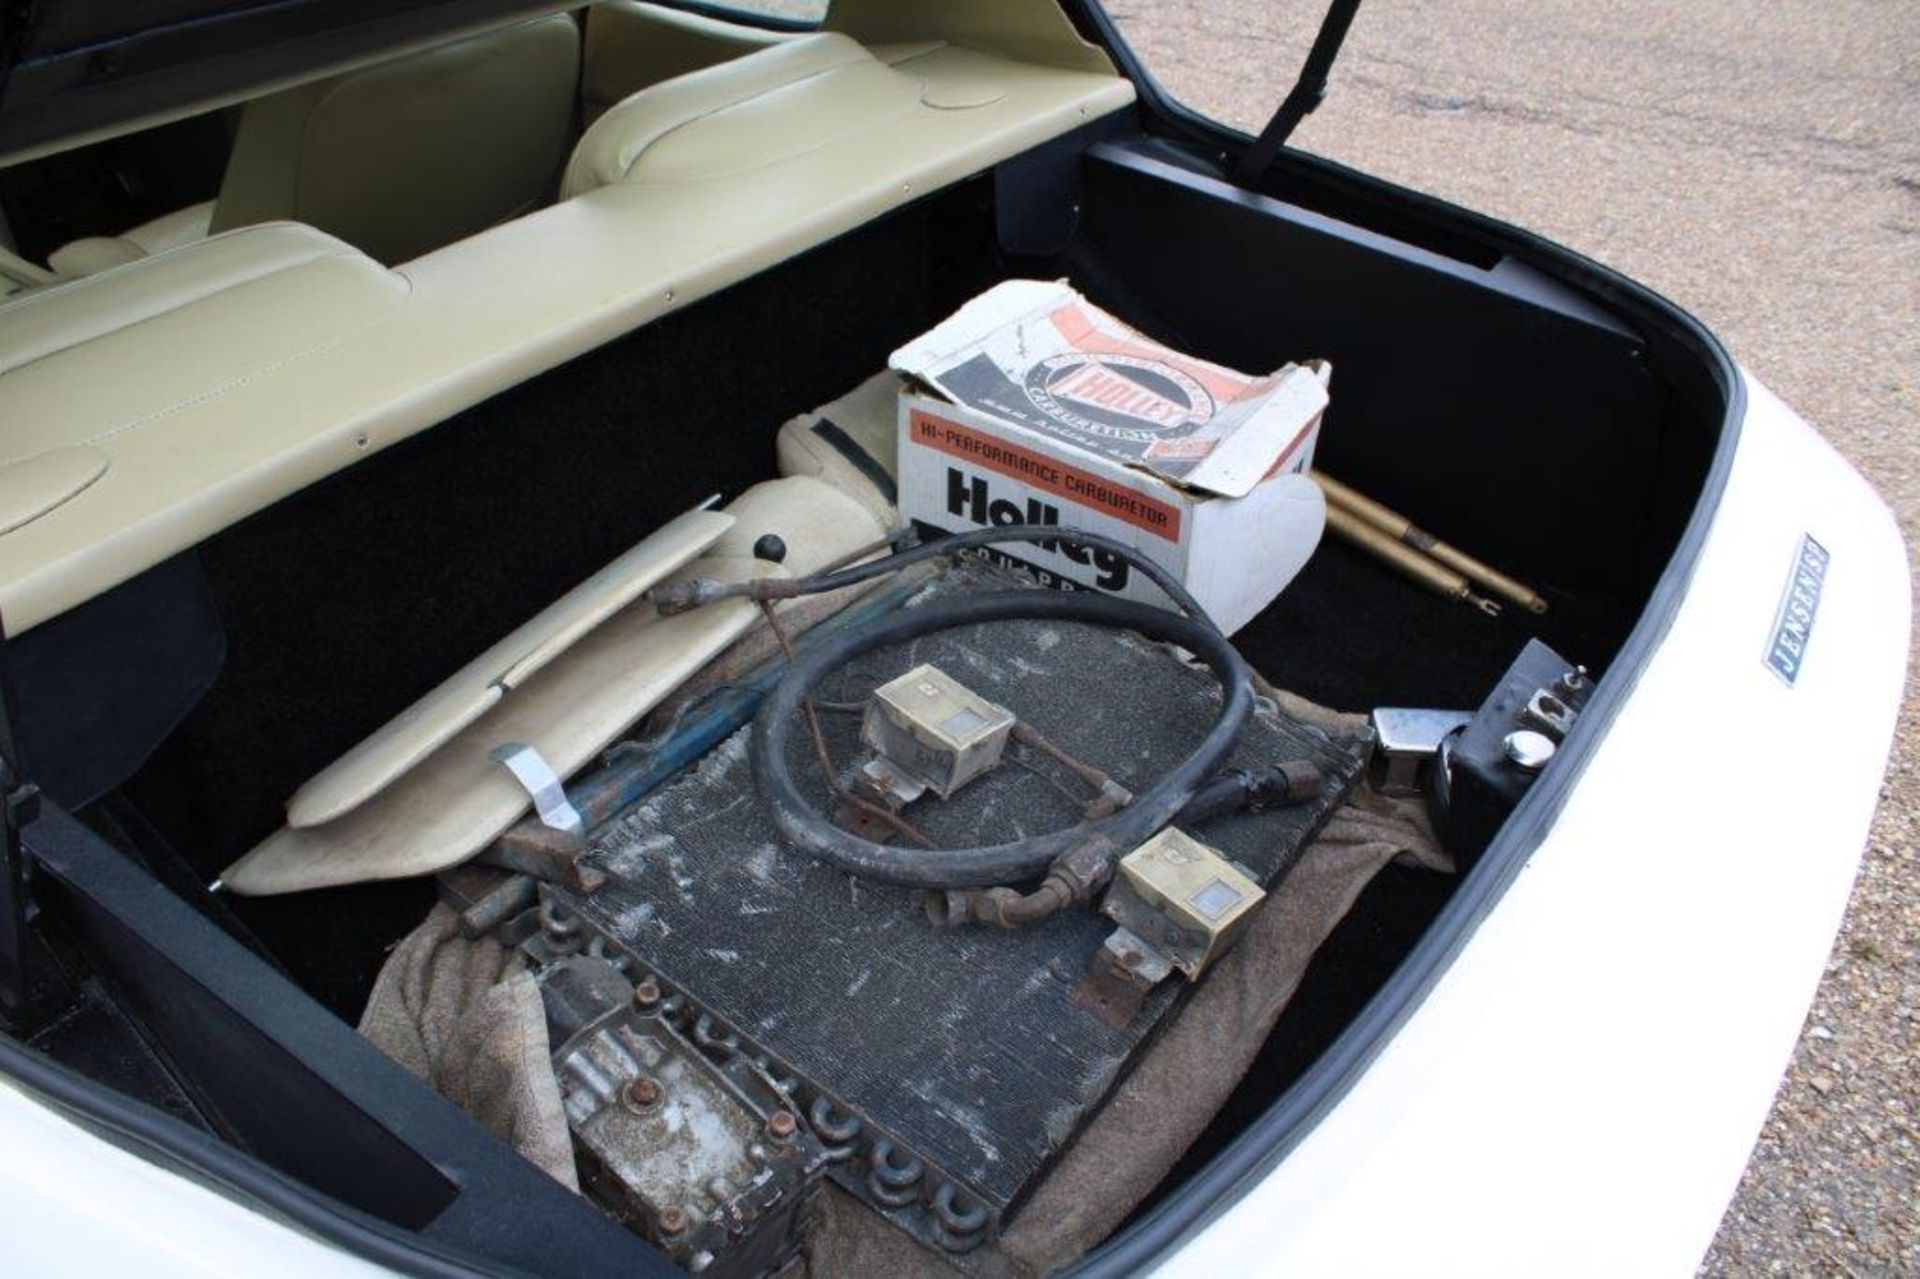 1972 Jensen Interceptor SP Auto - Image 15 of 32